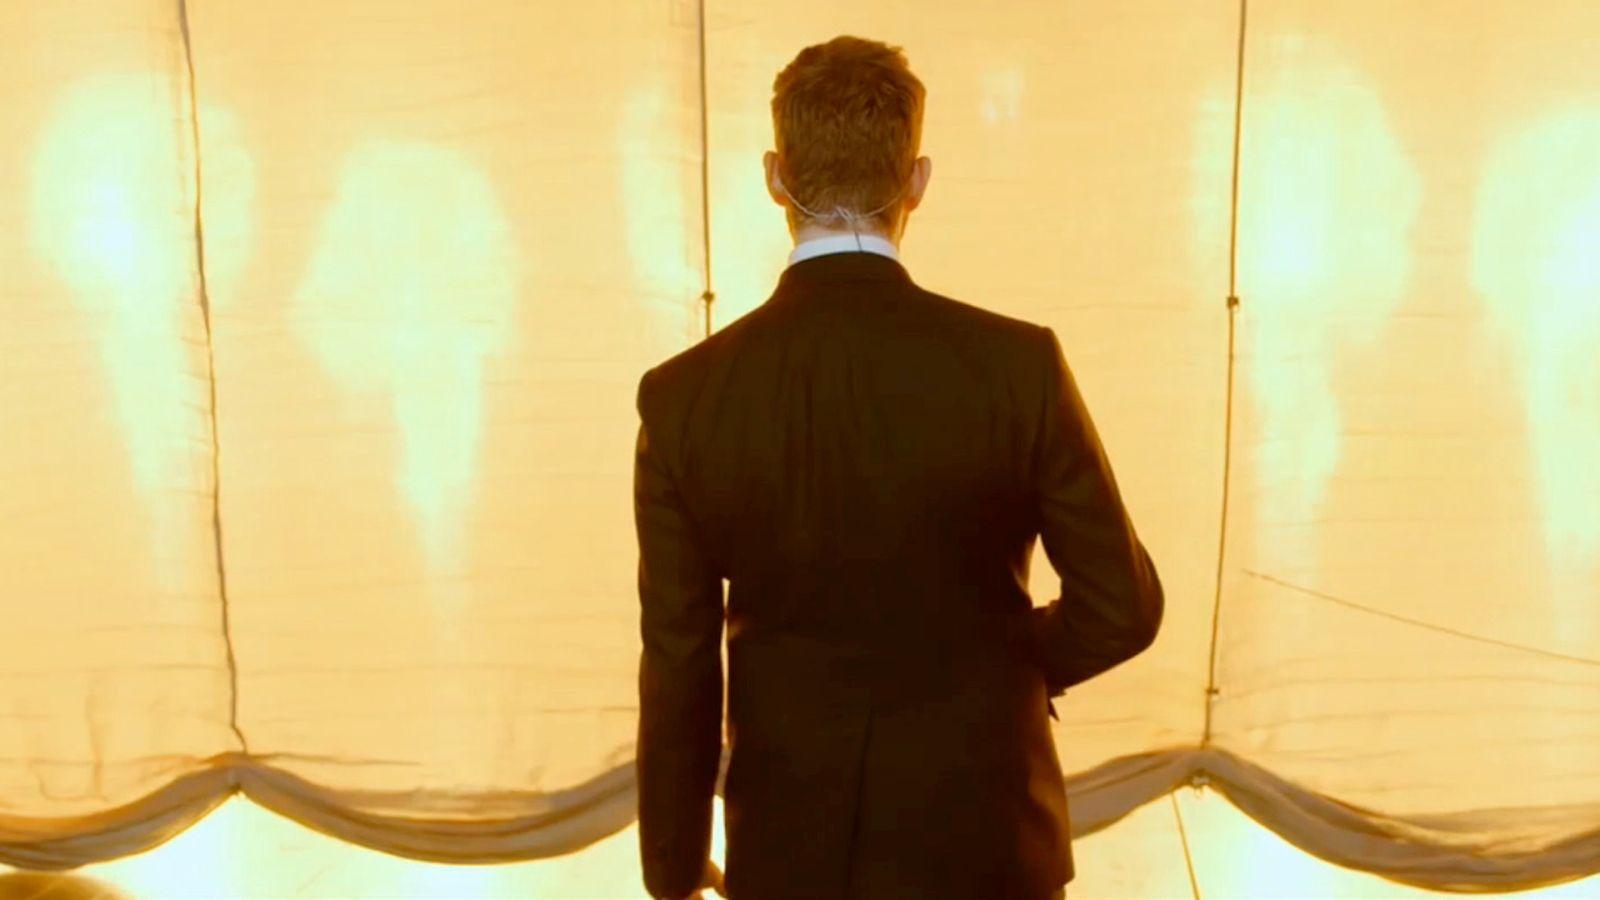 Michael Bublé - Tour Stop 148: un'immagine del documentario musicale